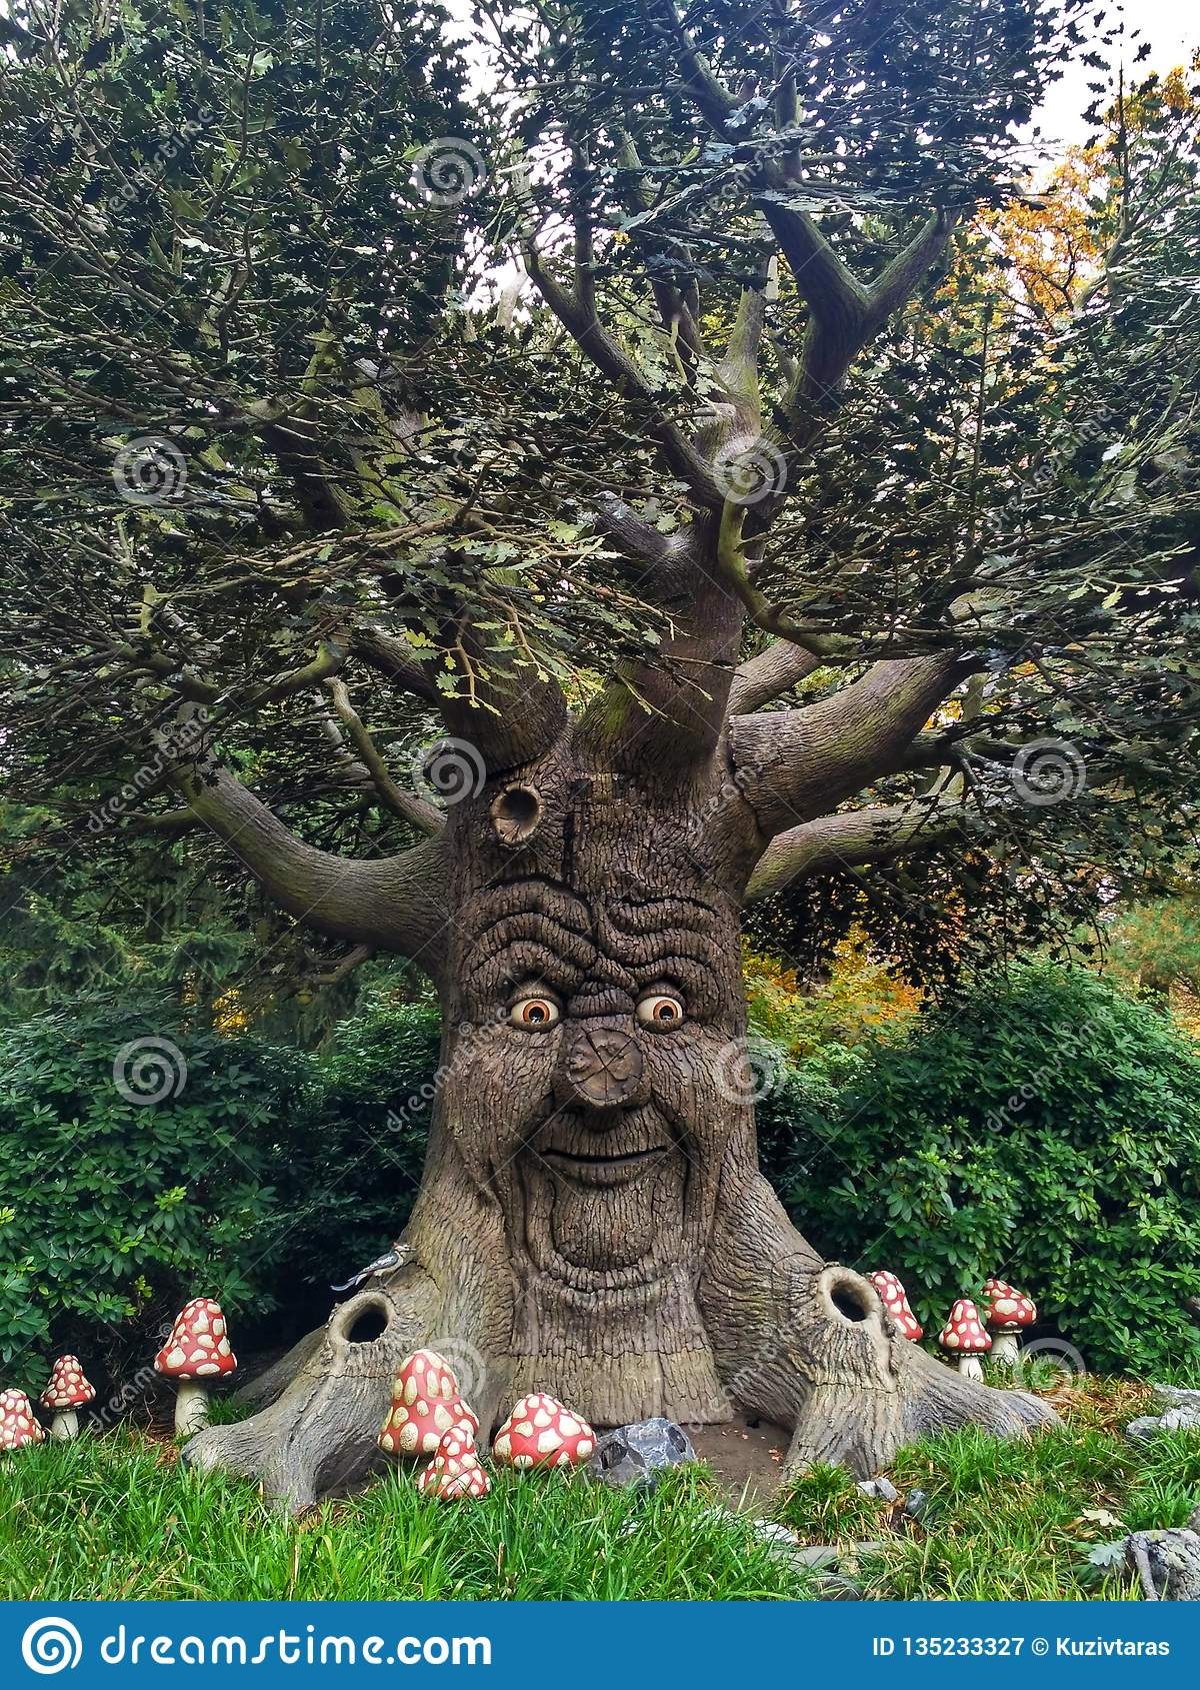 Kaatsheuvel / The Netherlands - November 03 2016: Speaking fairytale tree in Theme Park Efteling